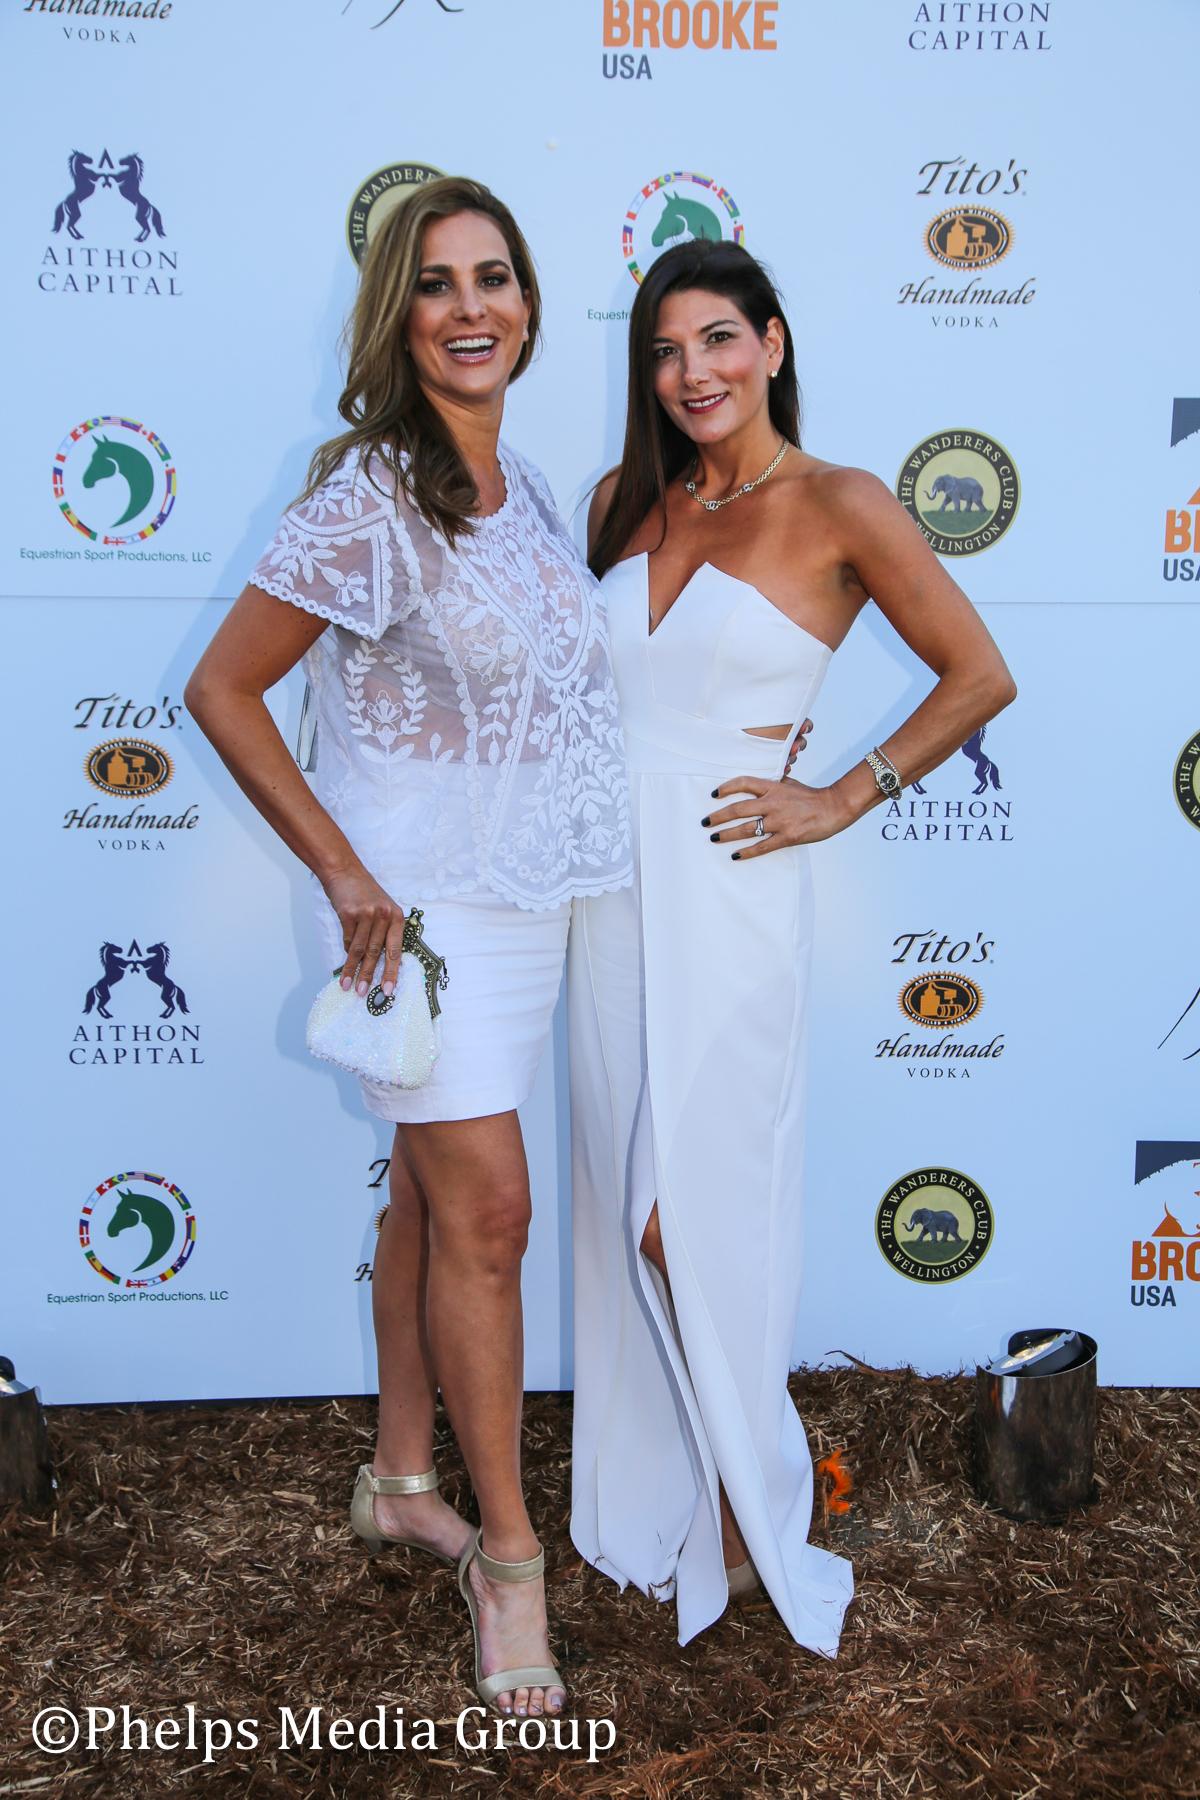 Deborah Lenchus and Dr LIsa Palmer; Nic Roldan's 2nd Annual Sunset Polo & White Party, FL, by Phelps Media.jpg